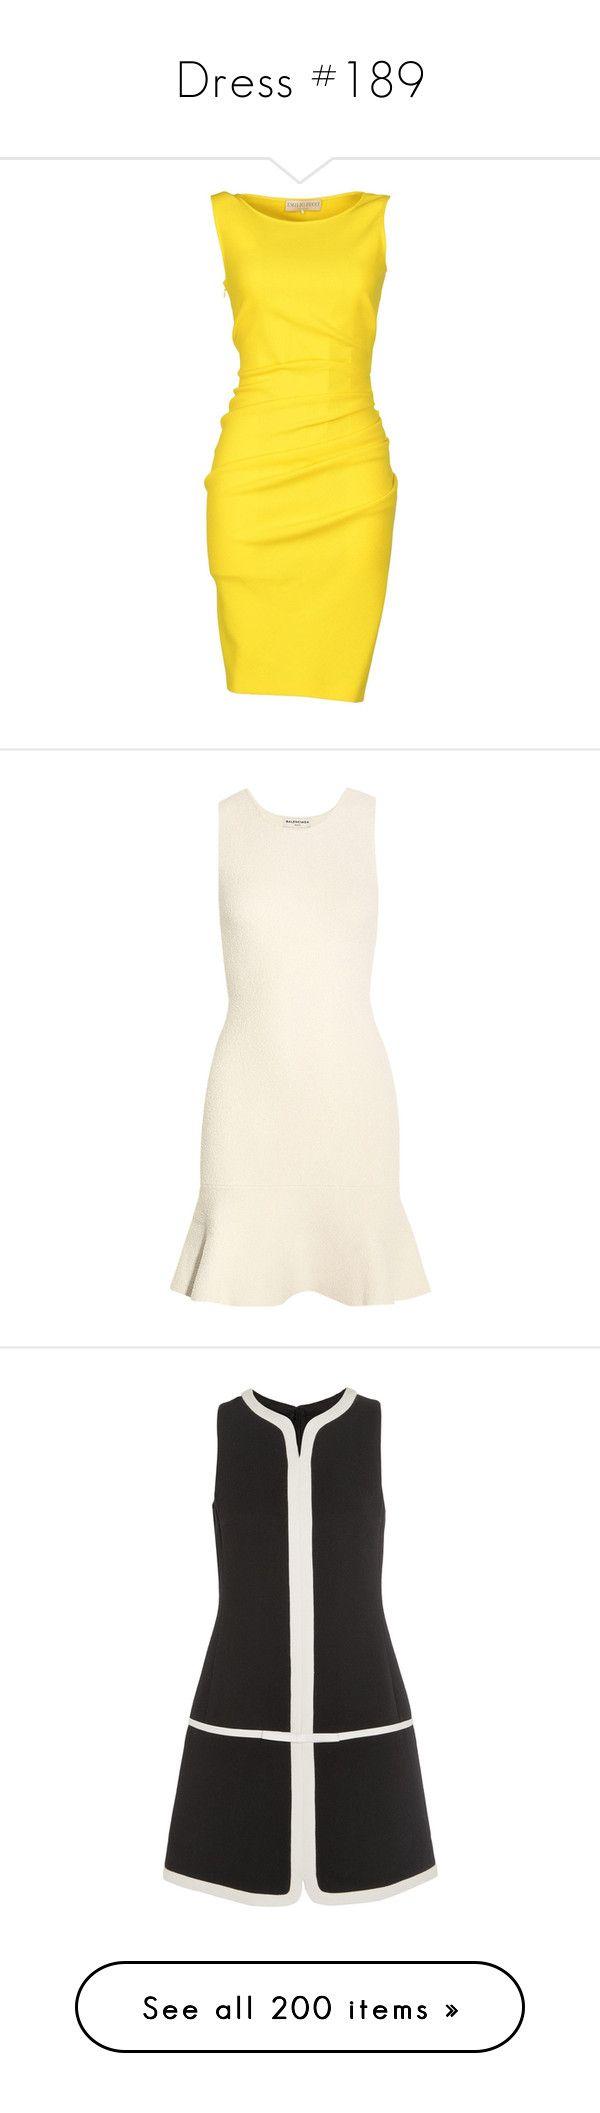 """Dress #189"" by bliznec-anna ❤ liked on Polyvore featuring dresses, vestidos, yellow, short dresses, knee-length dresses, emilio pucci dress, stretch dress, mini dress, white and stretch mini dress"